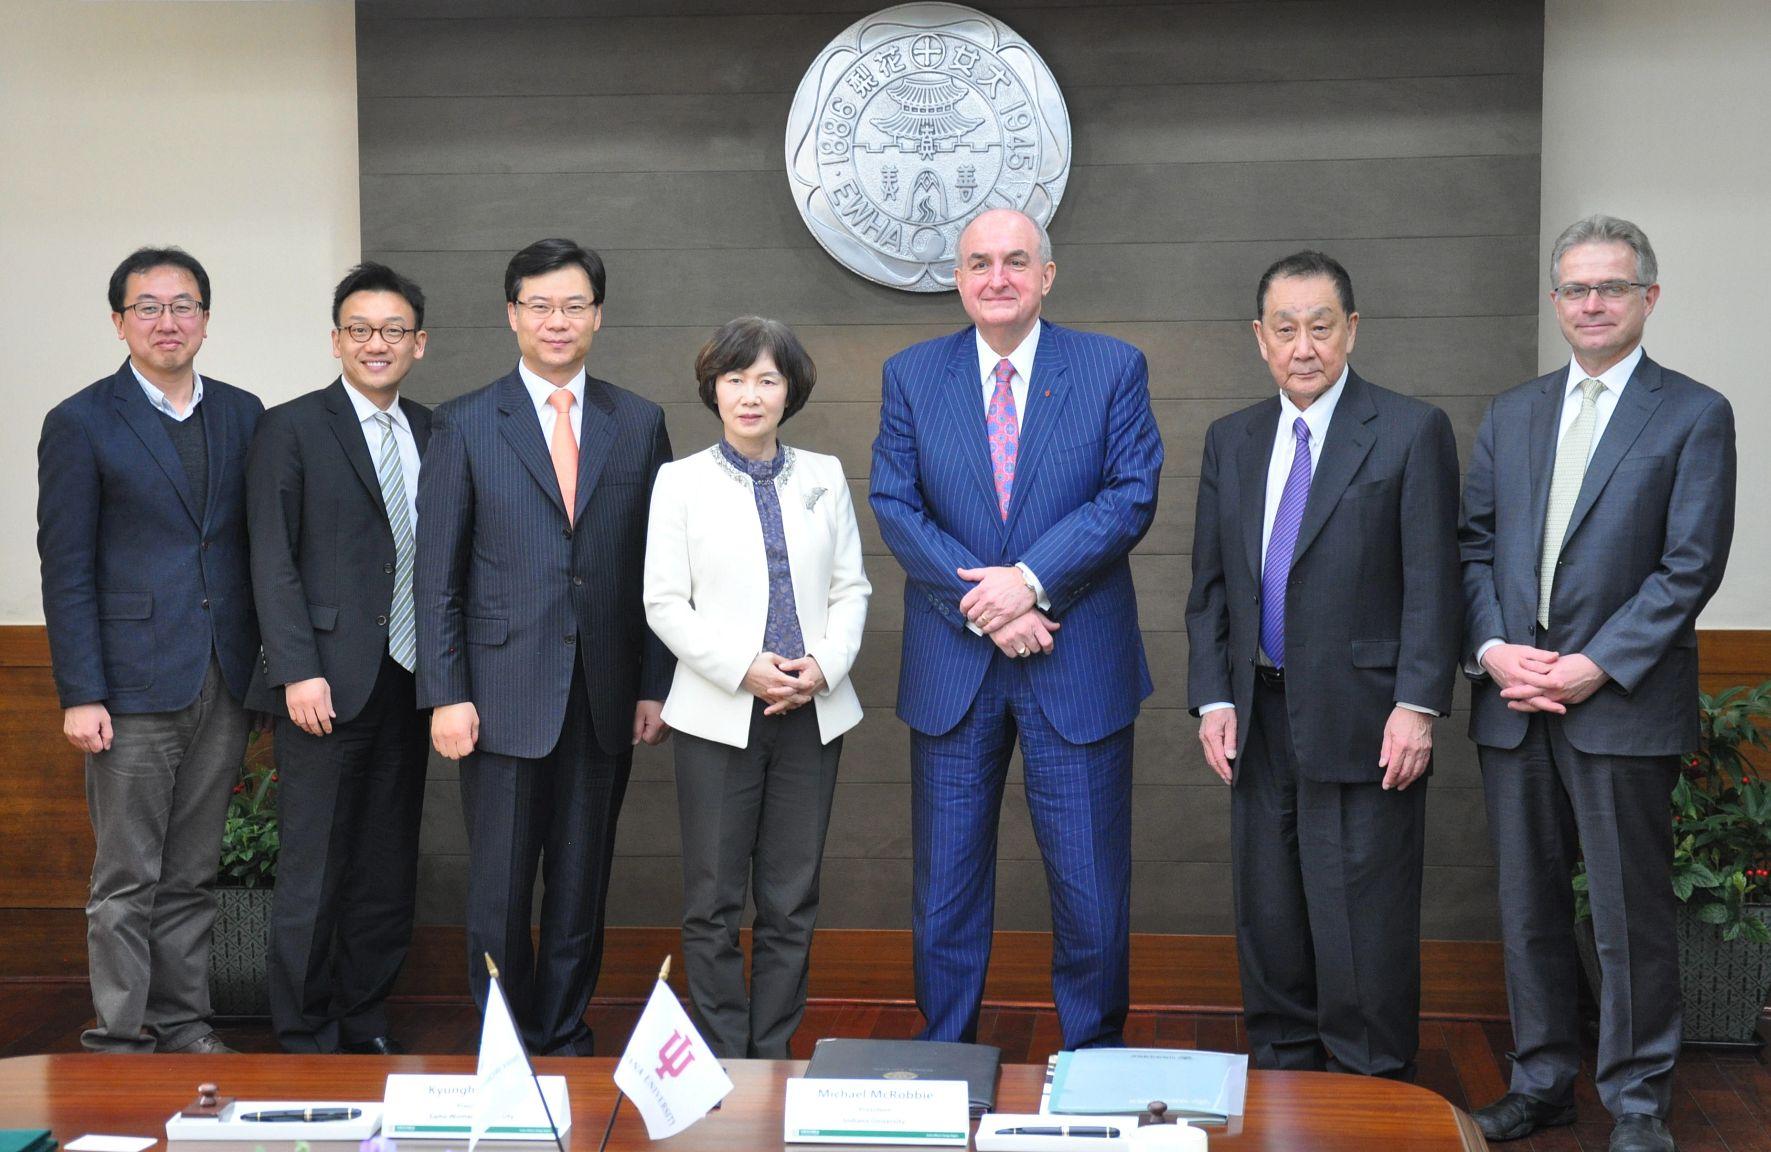 President McRobbie with international partners in South Korea